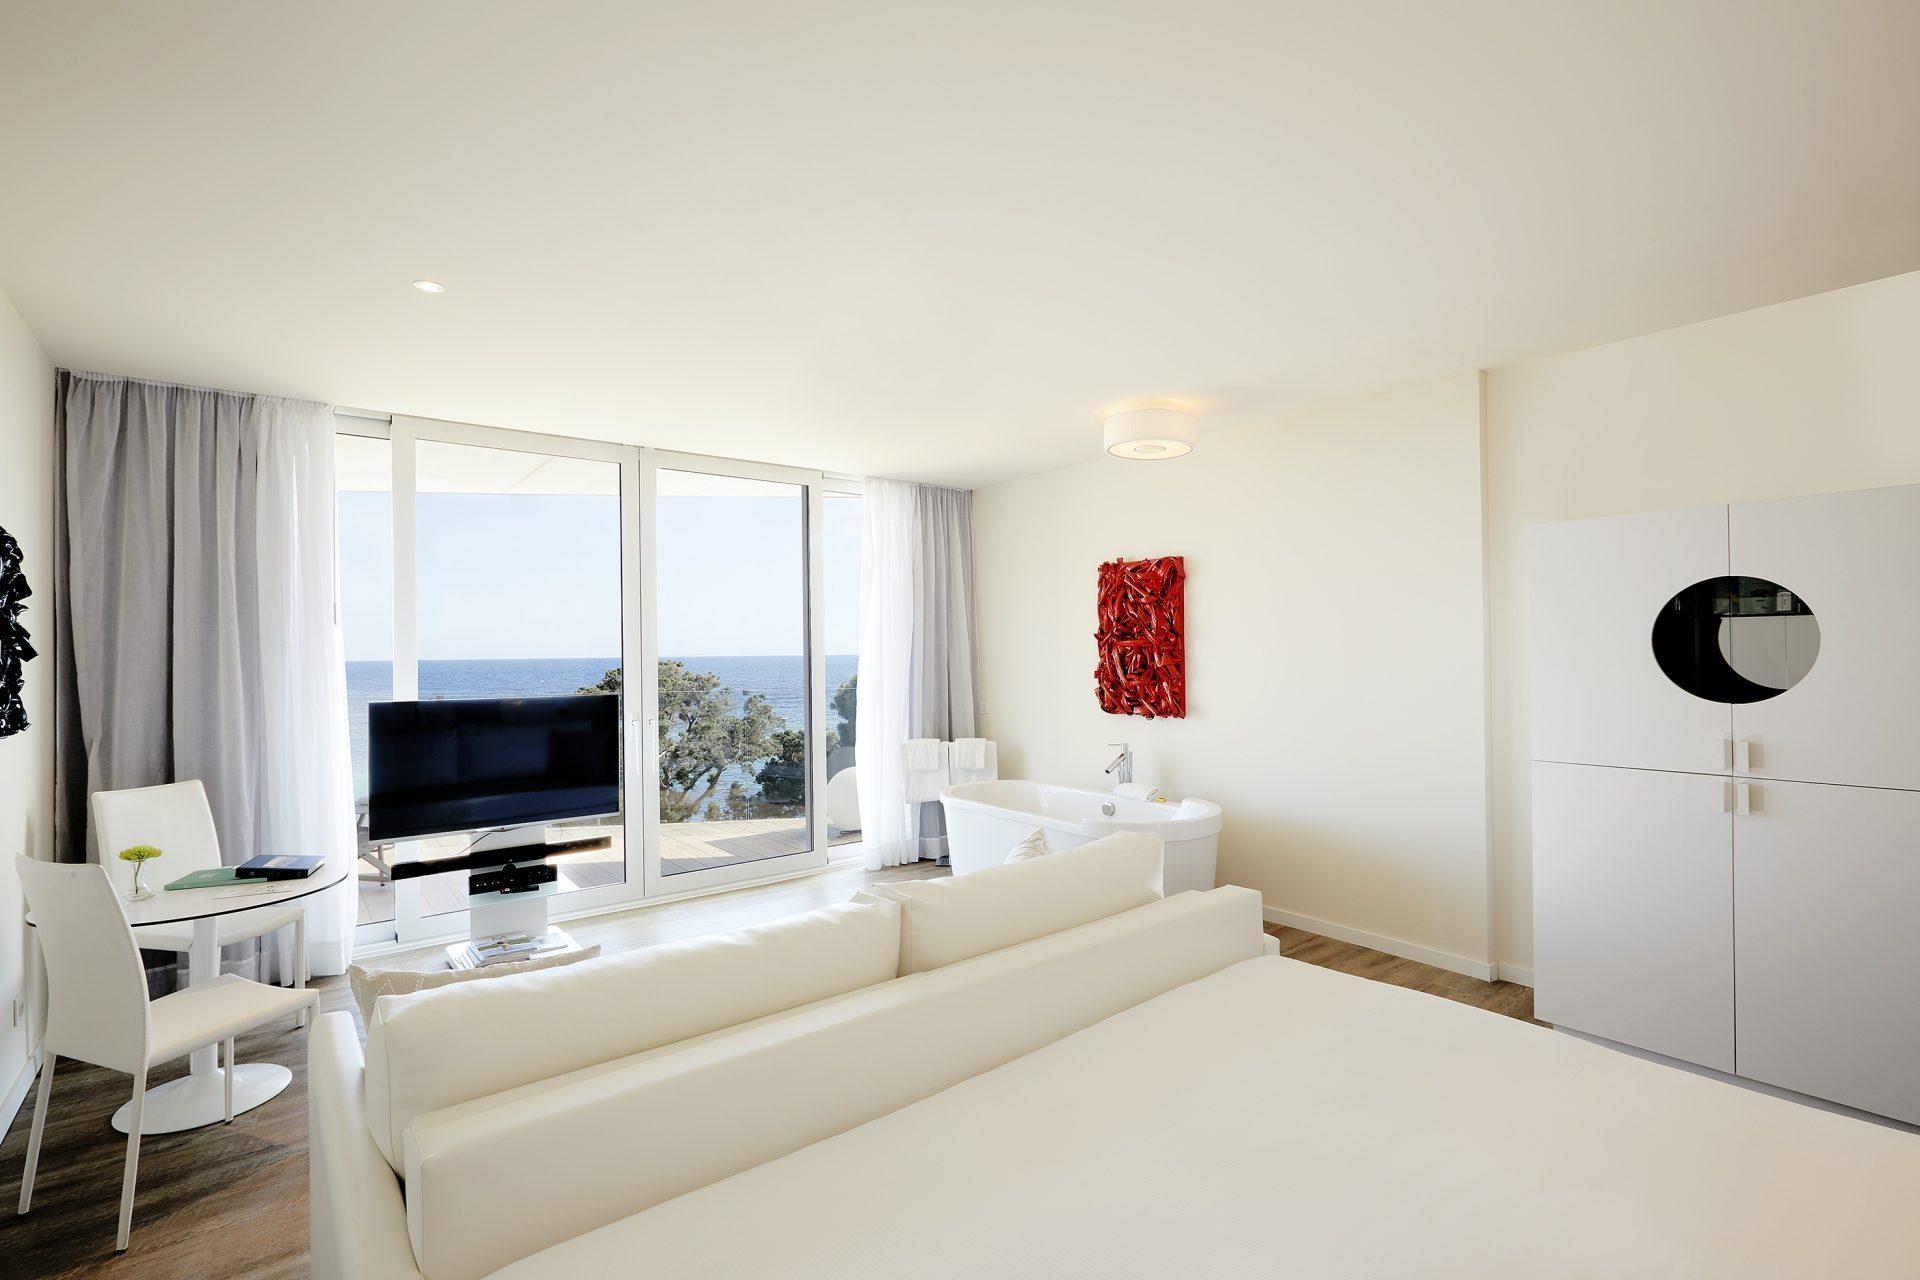 121cME Ibiza Suite Chic